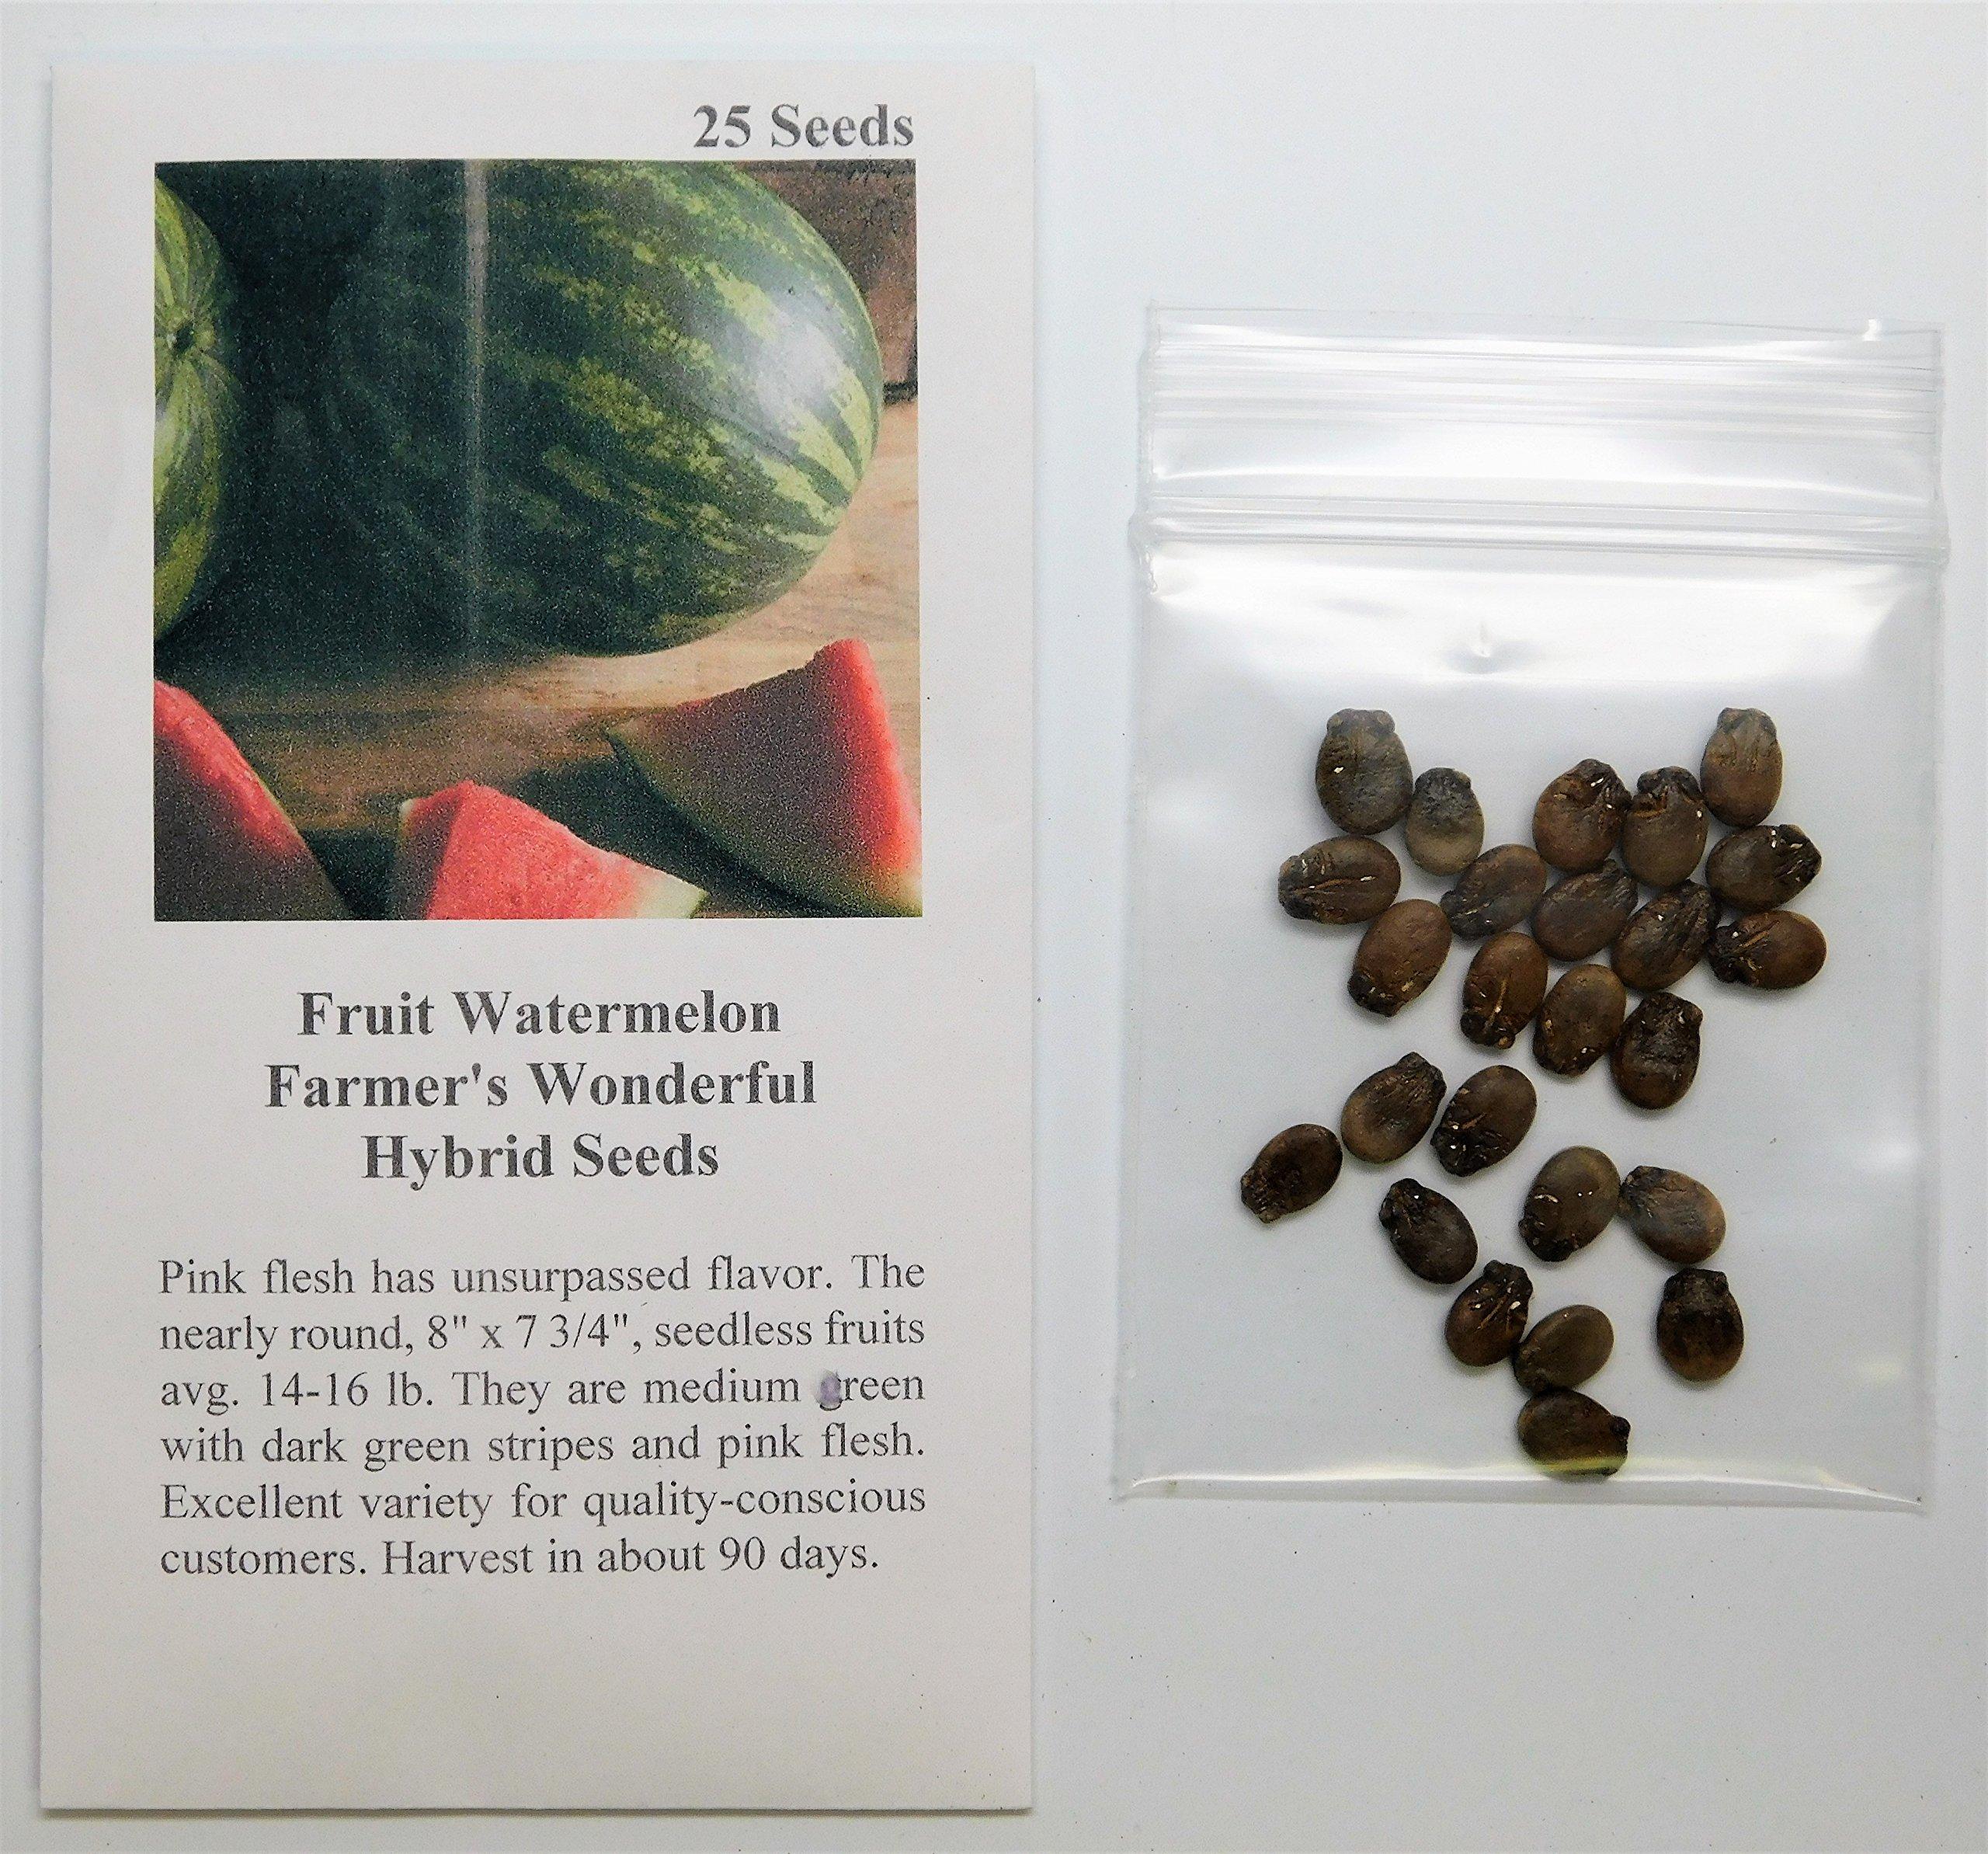 David's Garden Seeds Fruit Watermelon Farmer's Wonderful (Seedless) TO9365 (Red) 25 Non-GMO, Hybrid Seeds